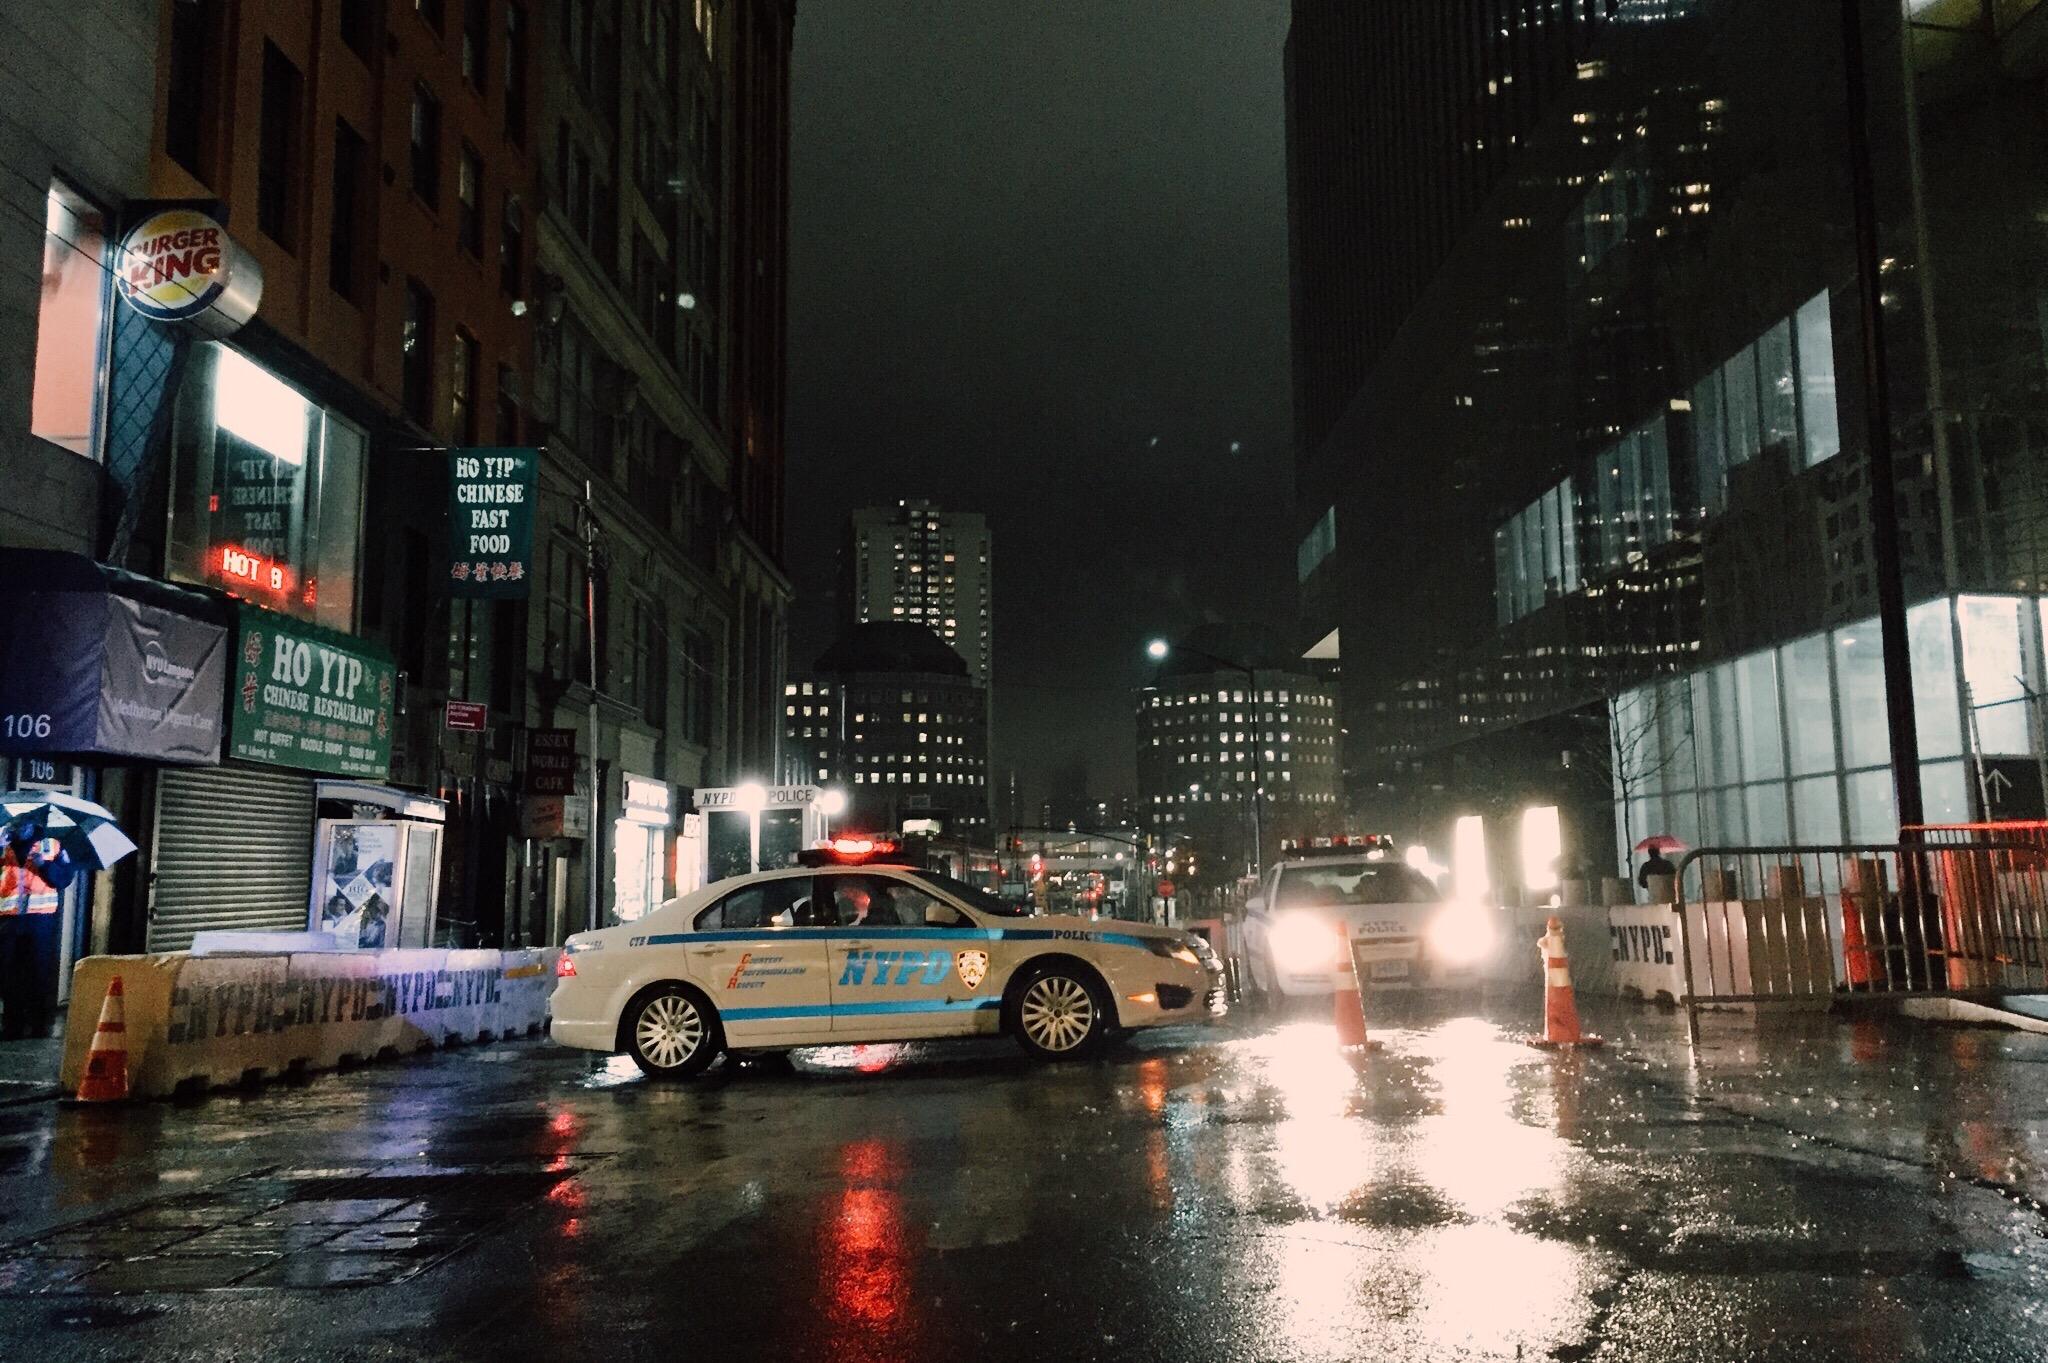 Financial District, New York